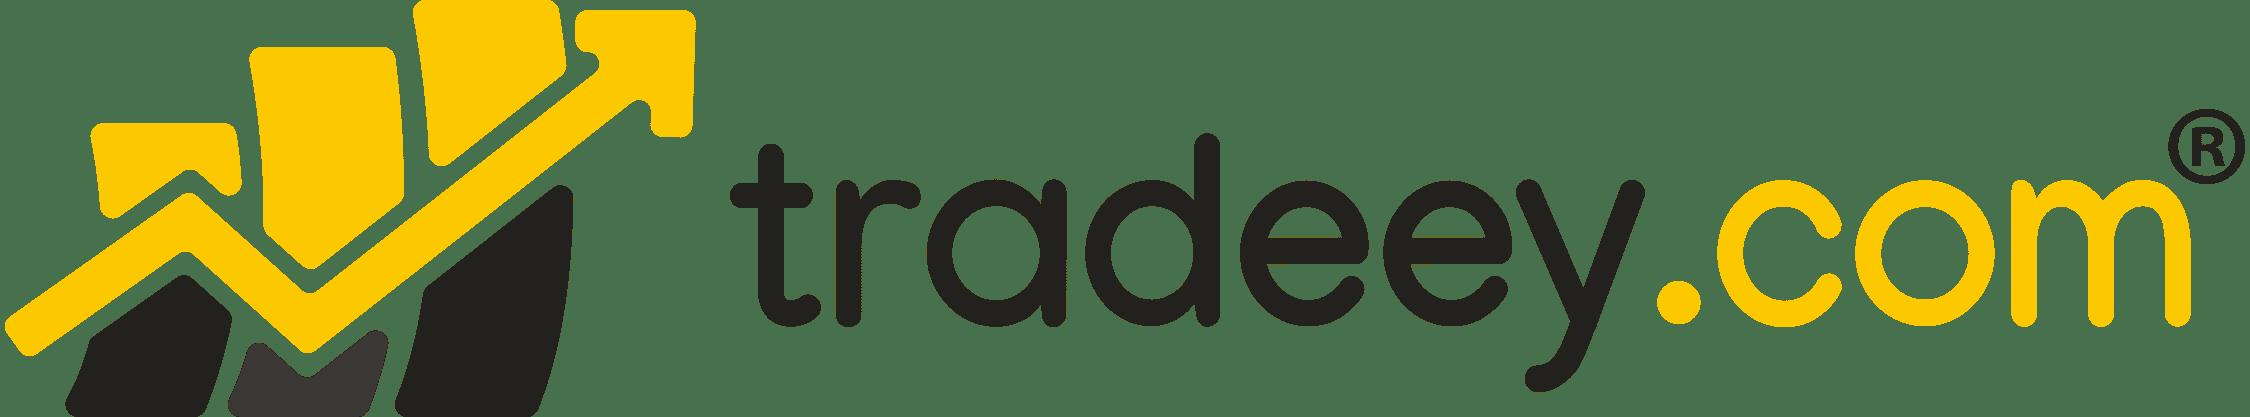 Tradeey